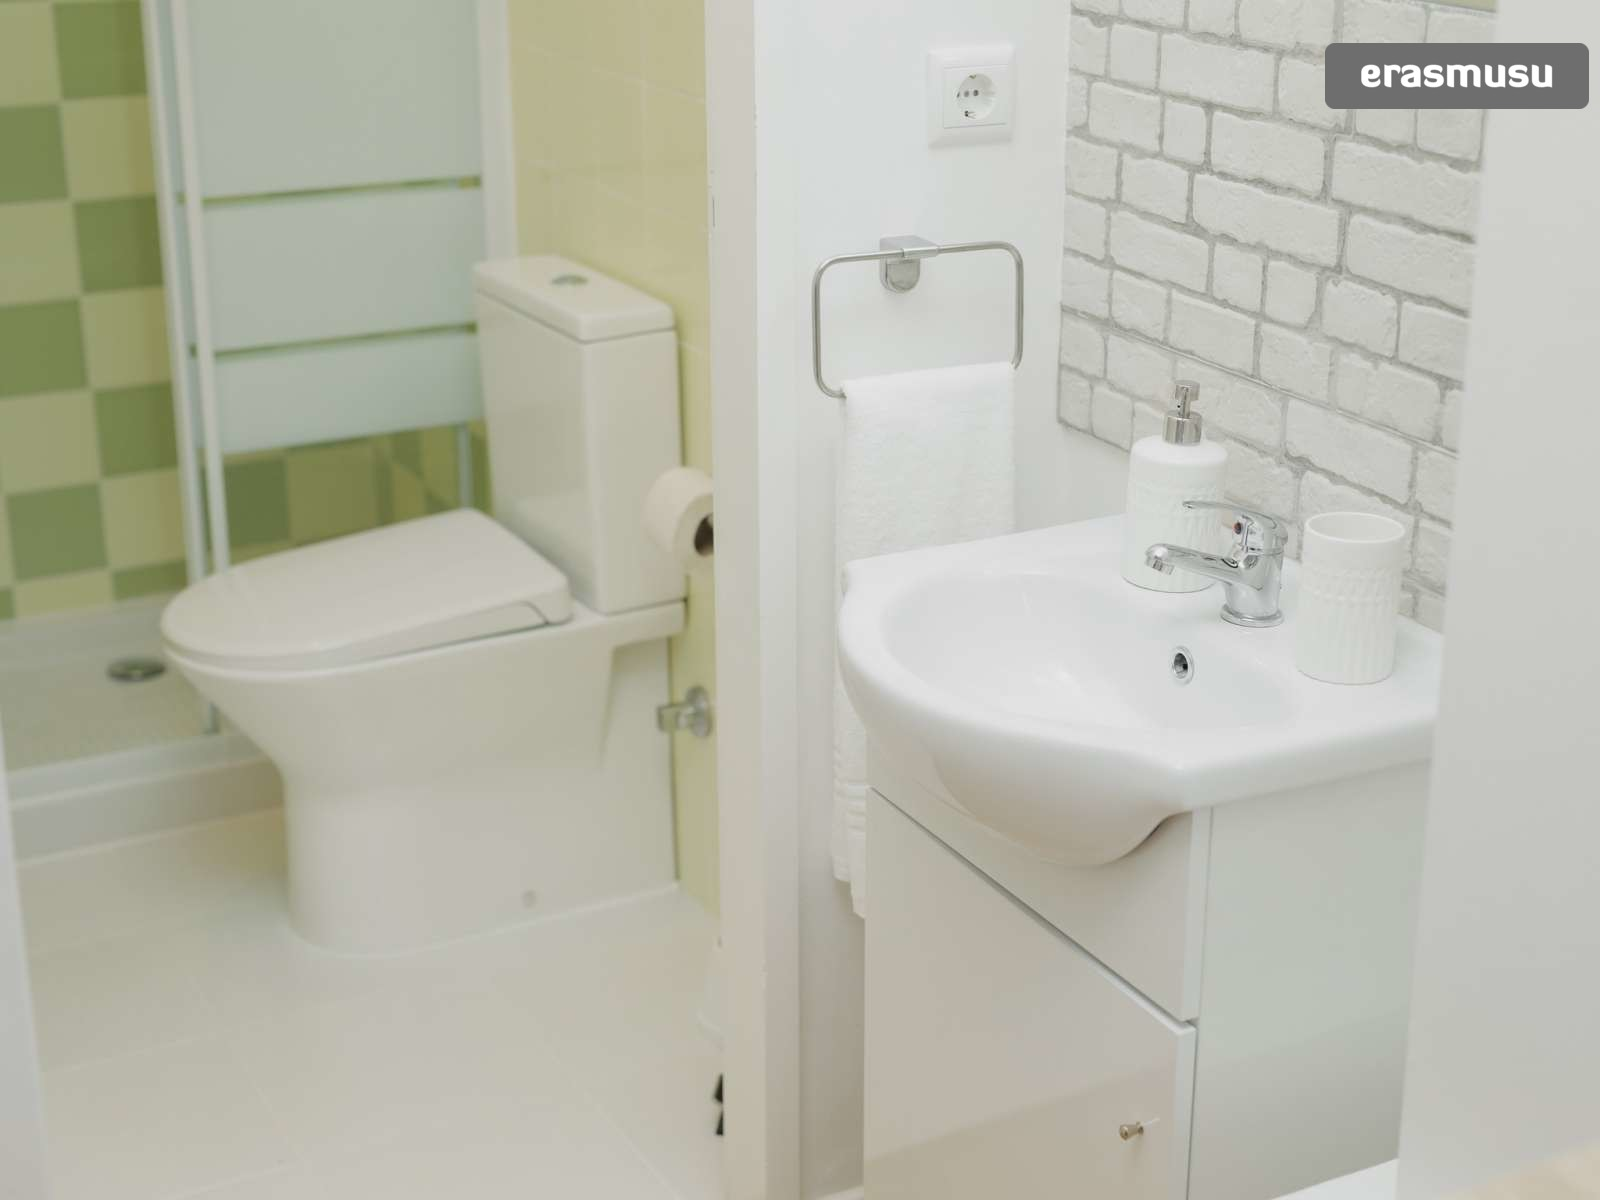 stunning-studio-apartment-rent-santo-ildefonso-ca2b2728f611cd9a2